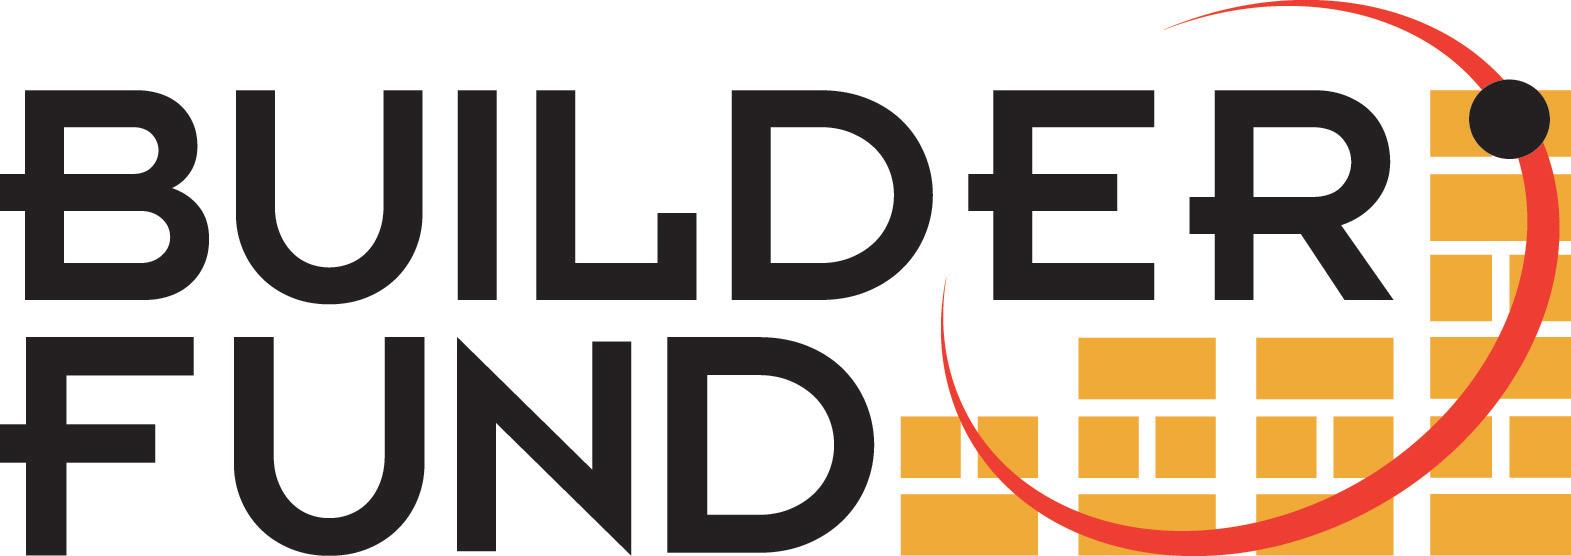 6.1.1_Entrepreneurial%20Resources_Builder%20Fund_logo.png